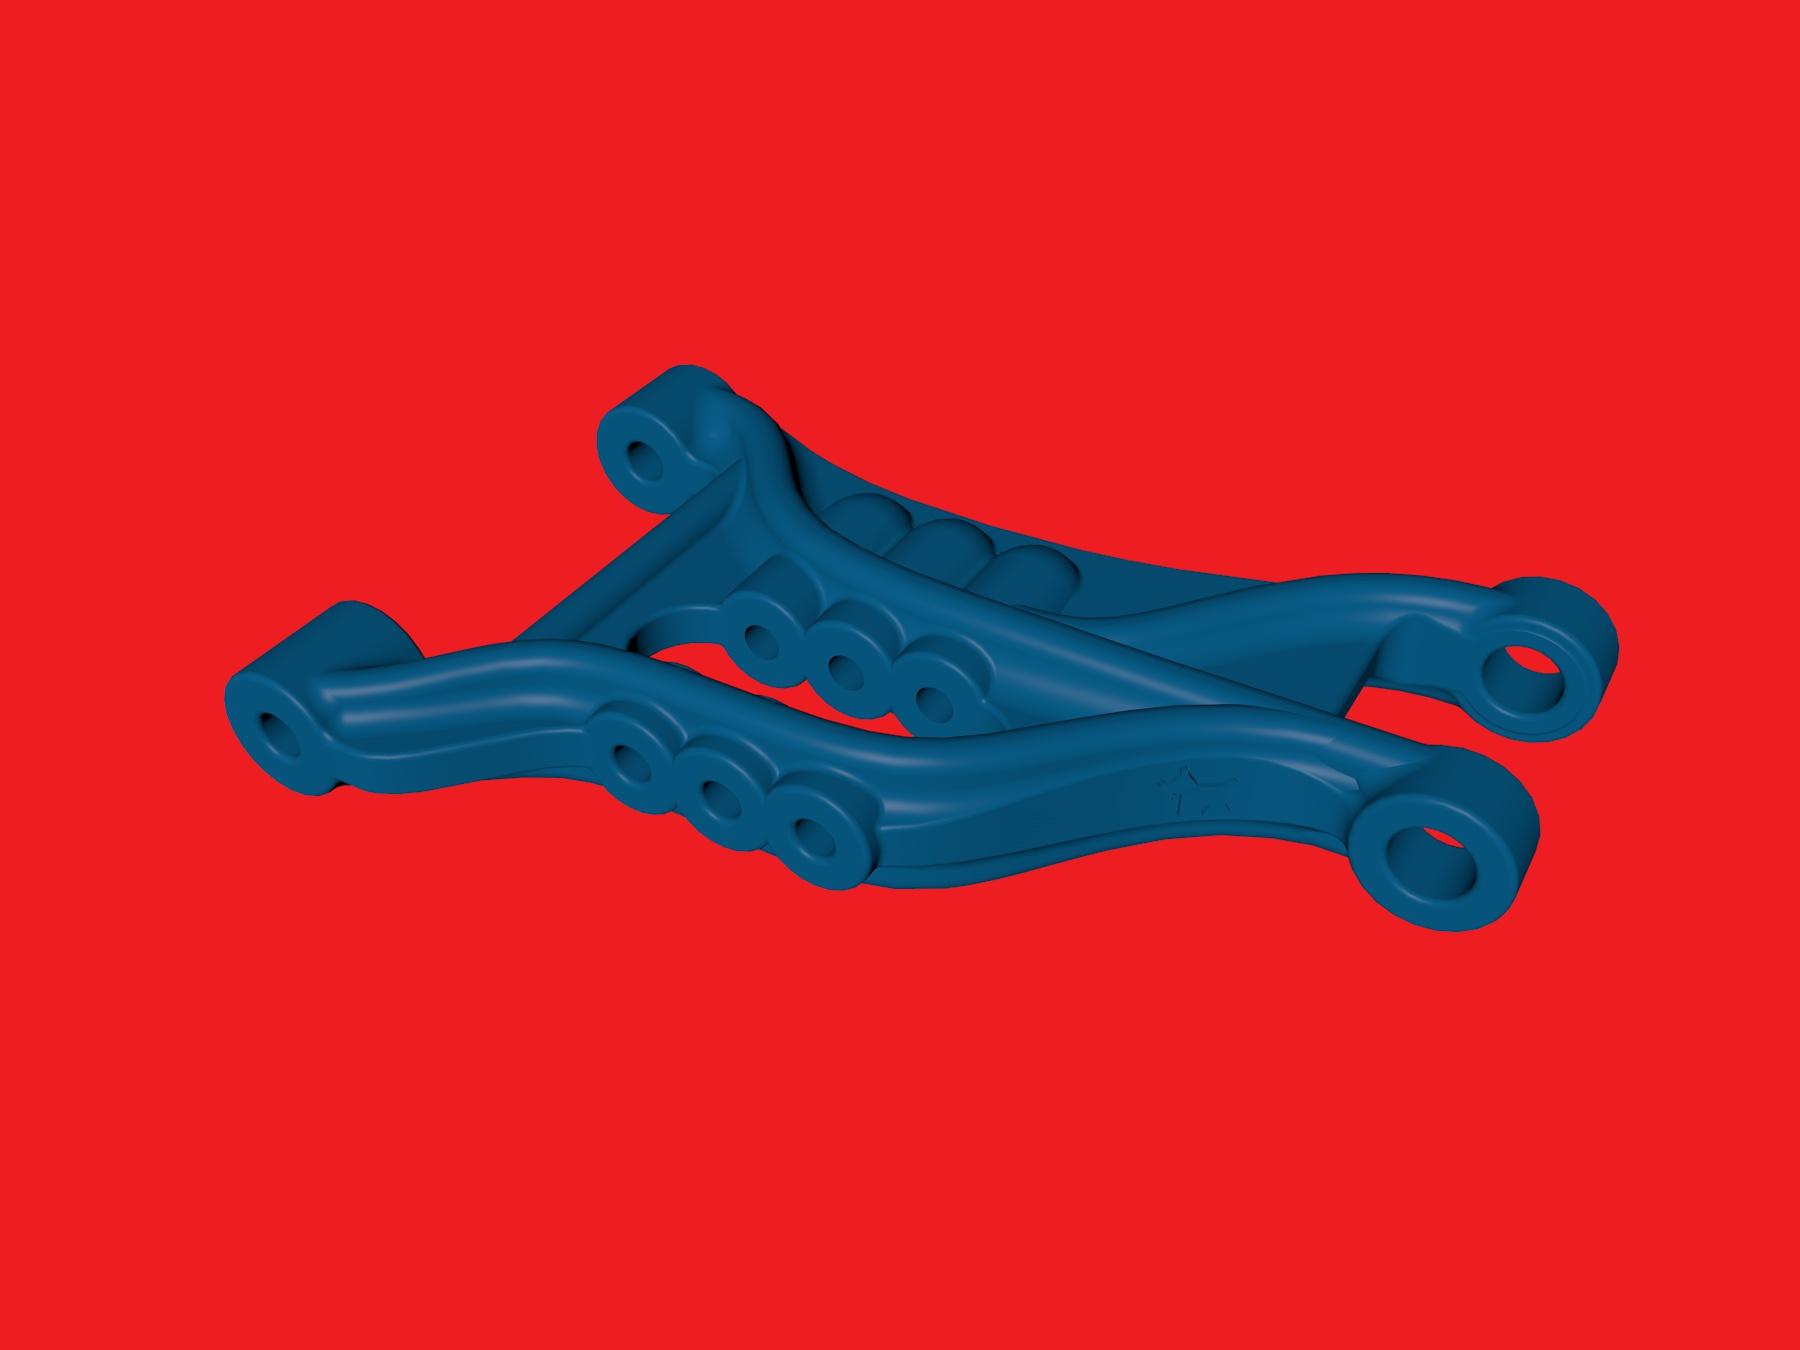 tamiya wrenchdog dyna storm b2 front suspension arm